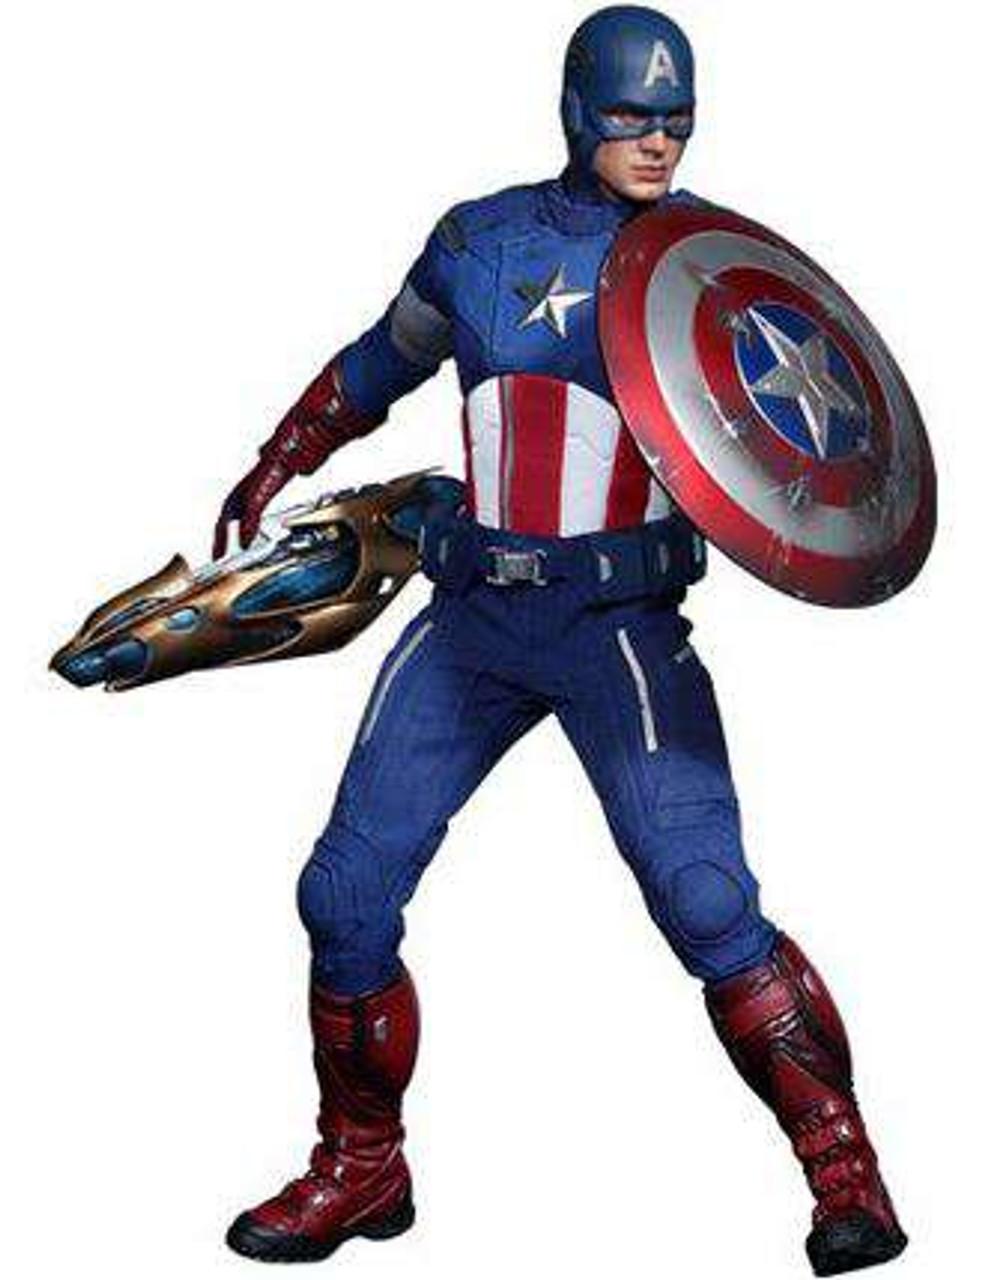 Marvel Avengers Movie Masterpiece Captain America 1/6 Collectible Figure [Avengers]